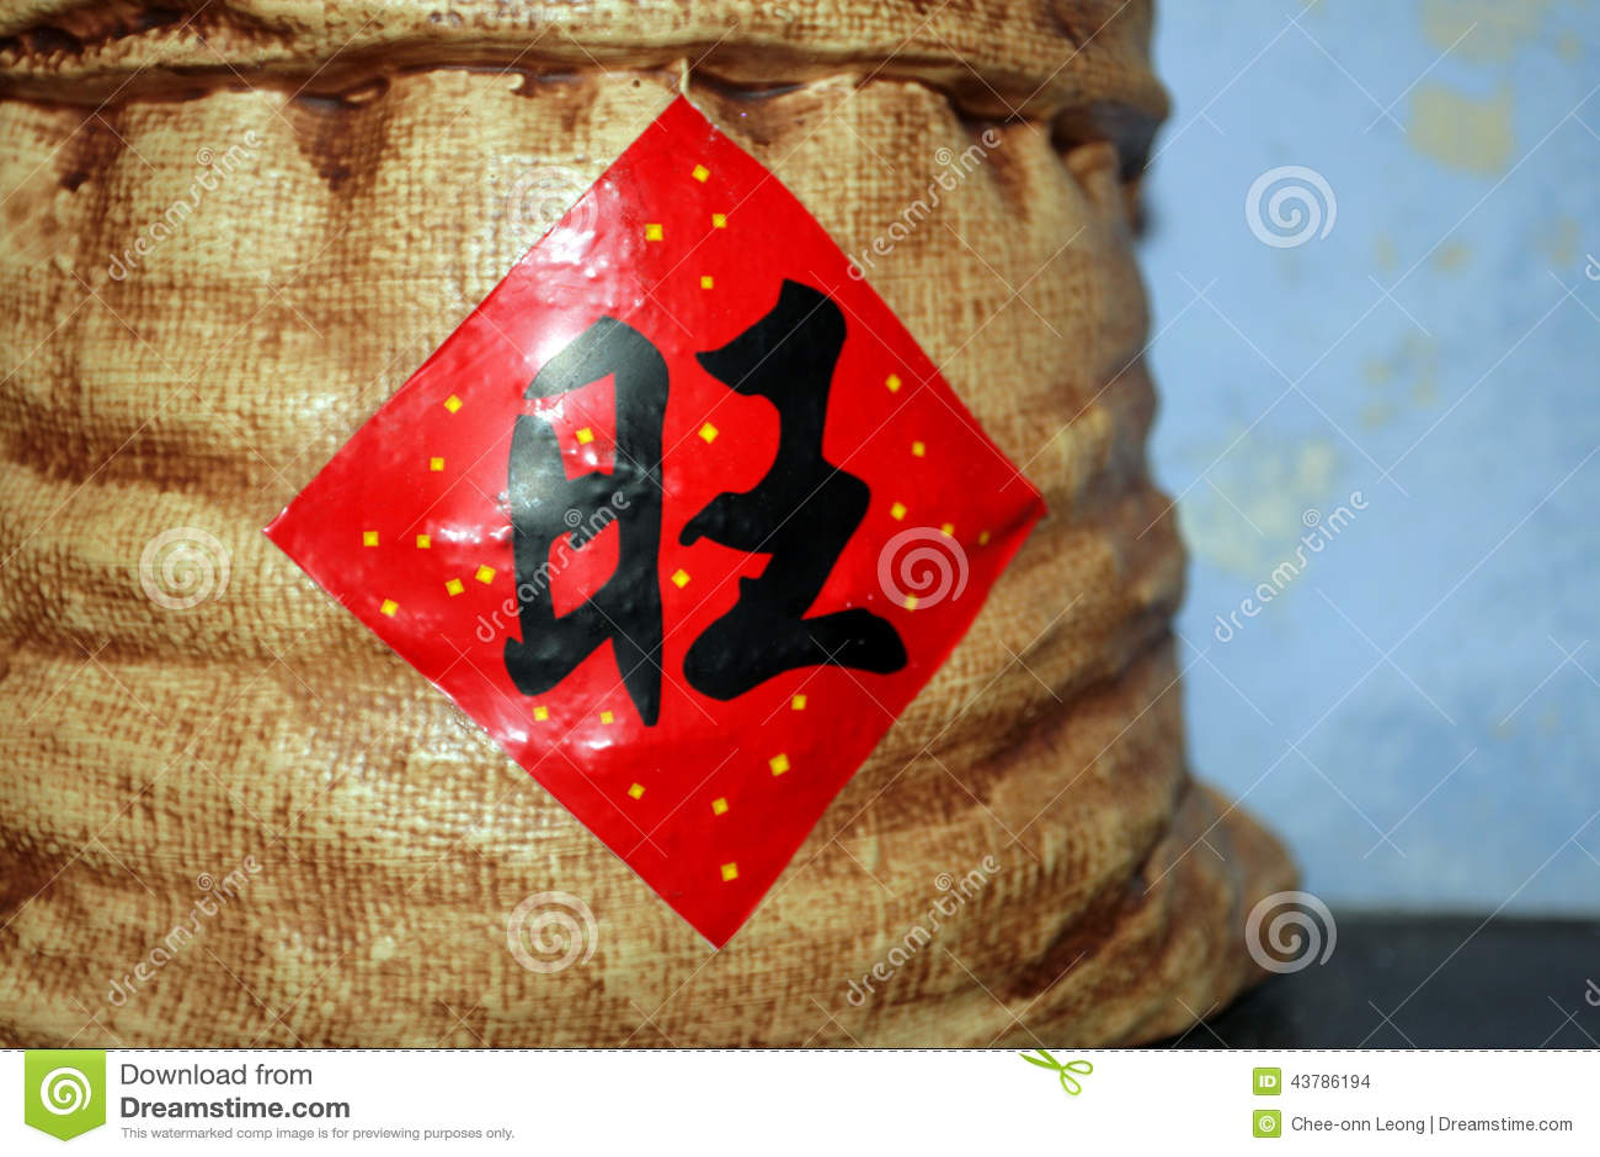 Asian calligraphy - Prosperous